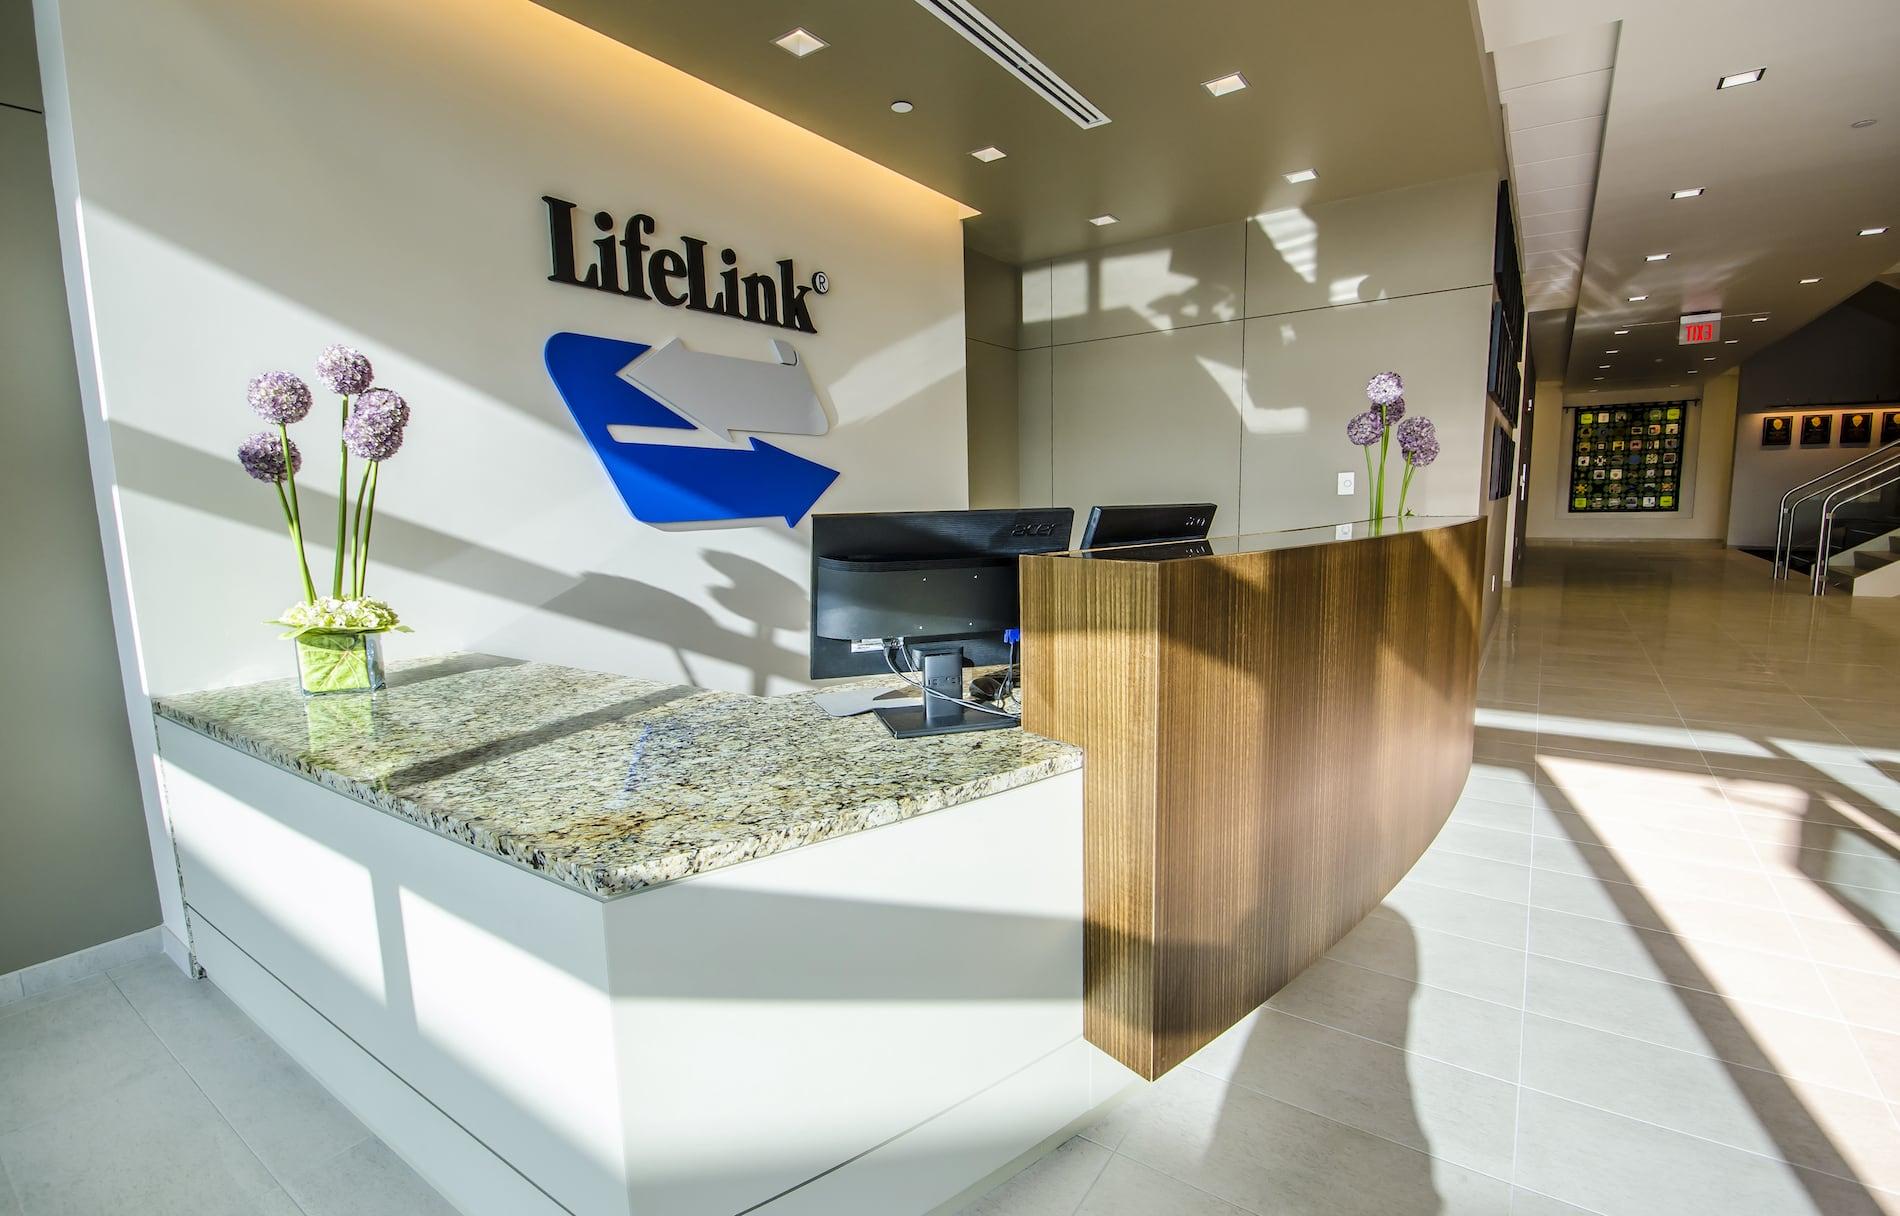 Life Link